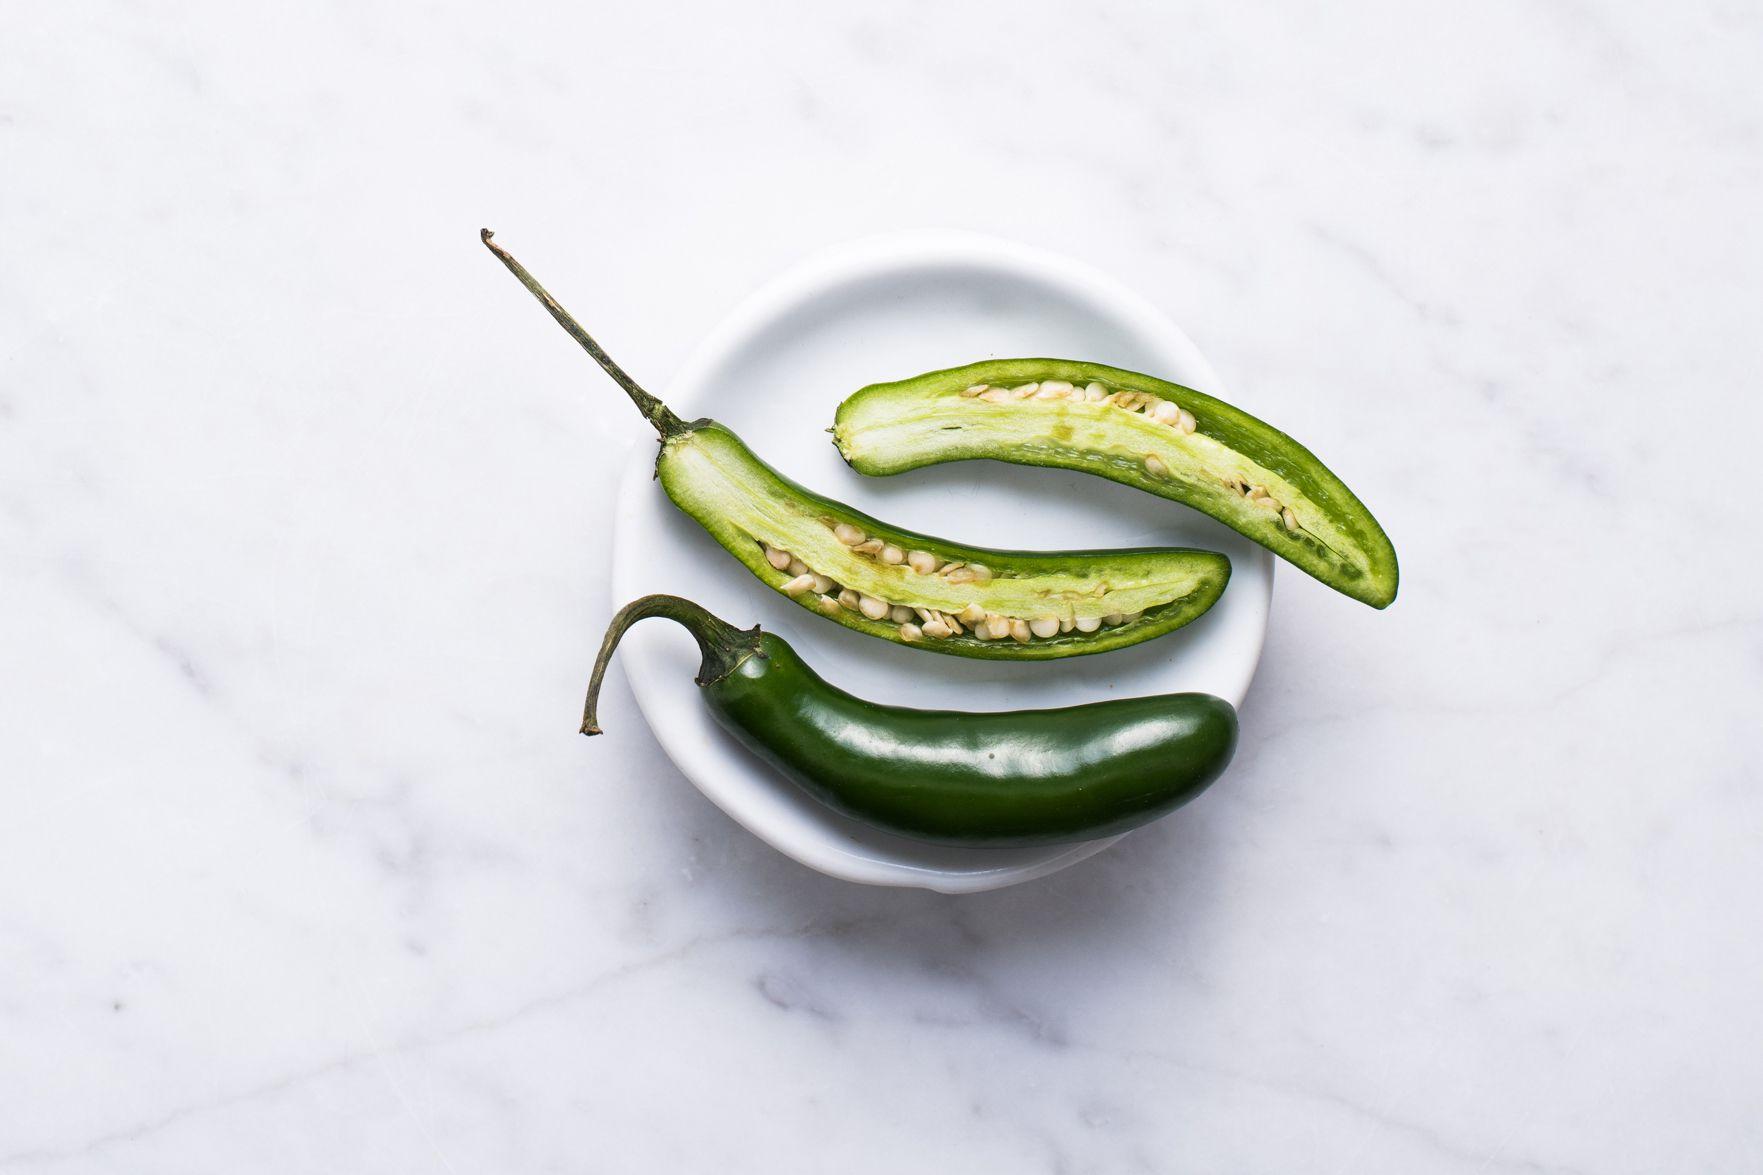 Chiles serranos